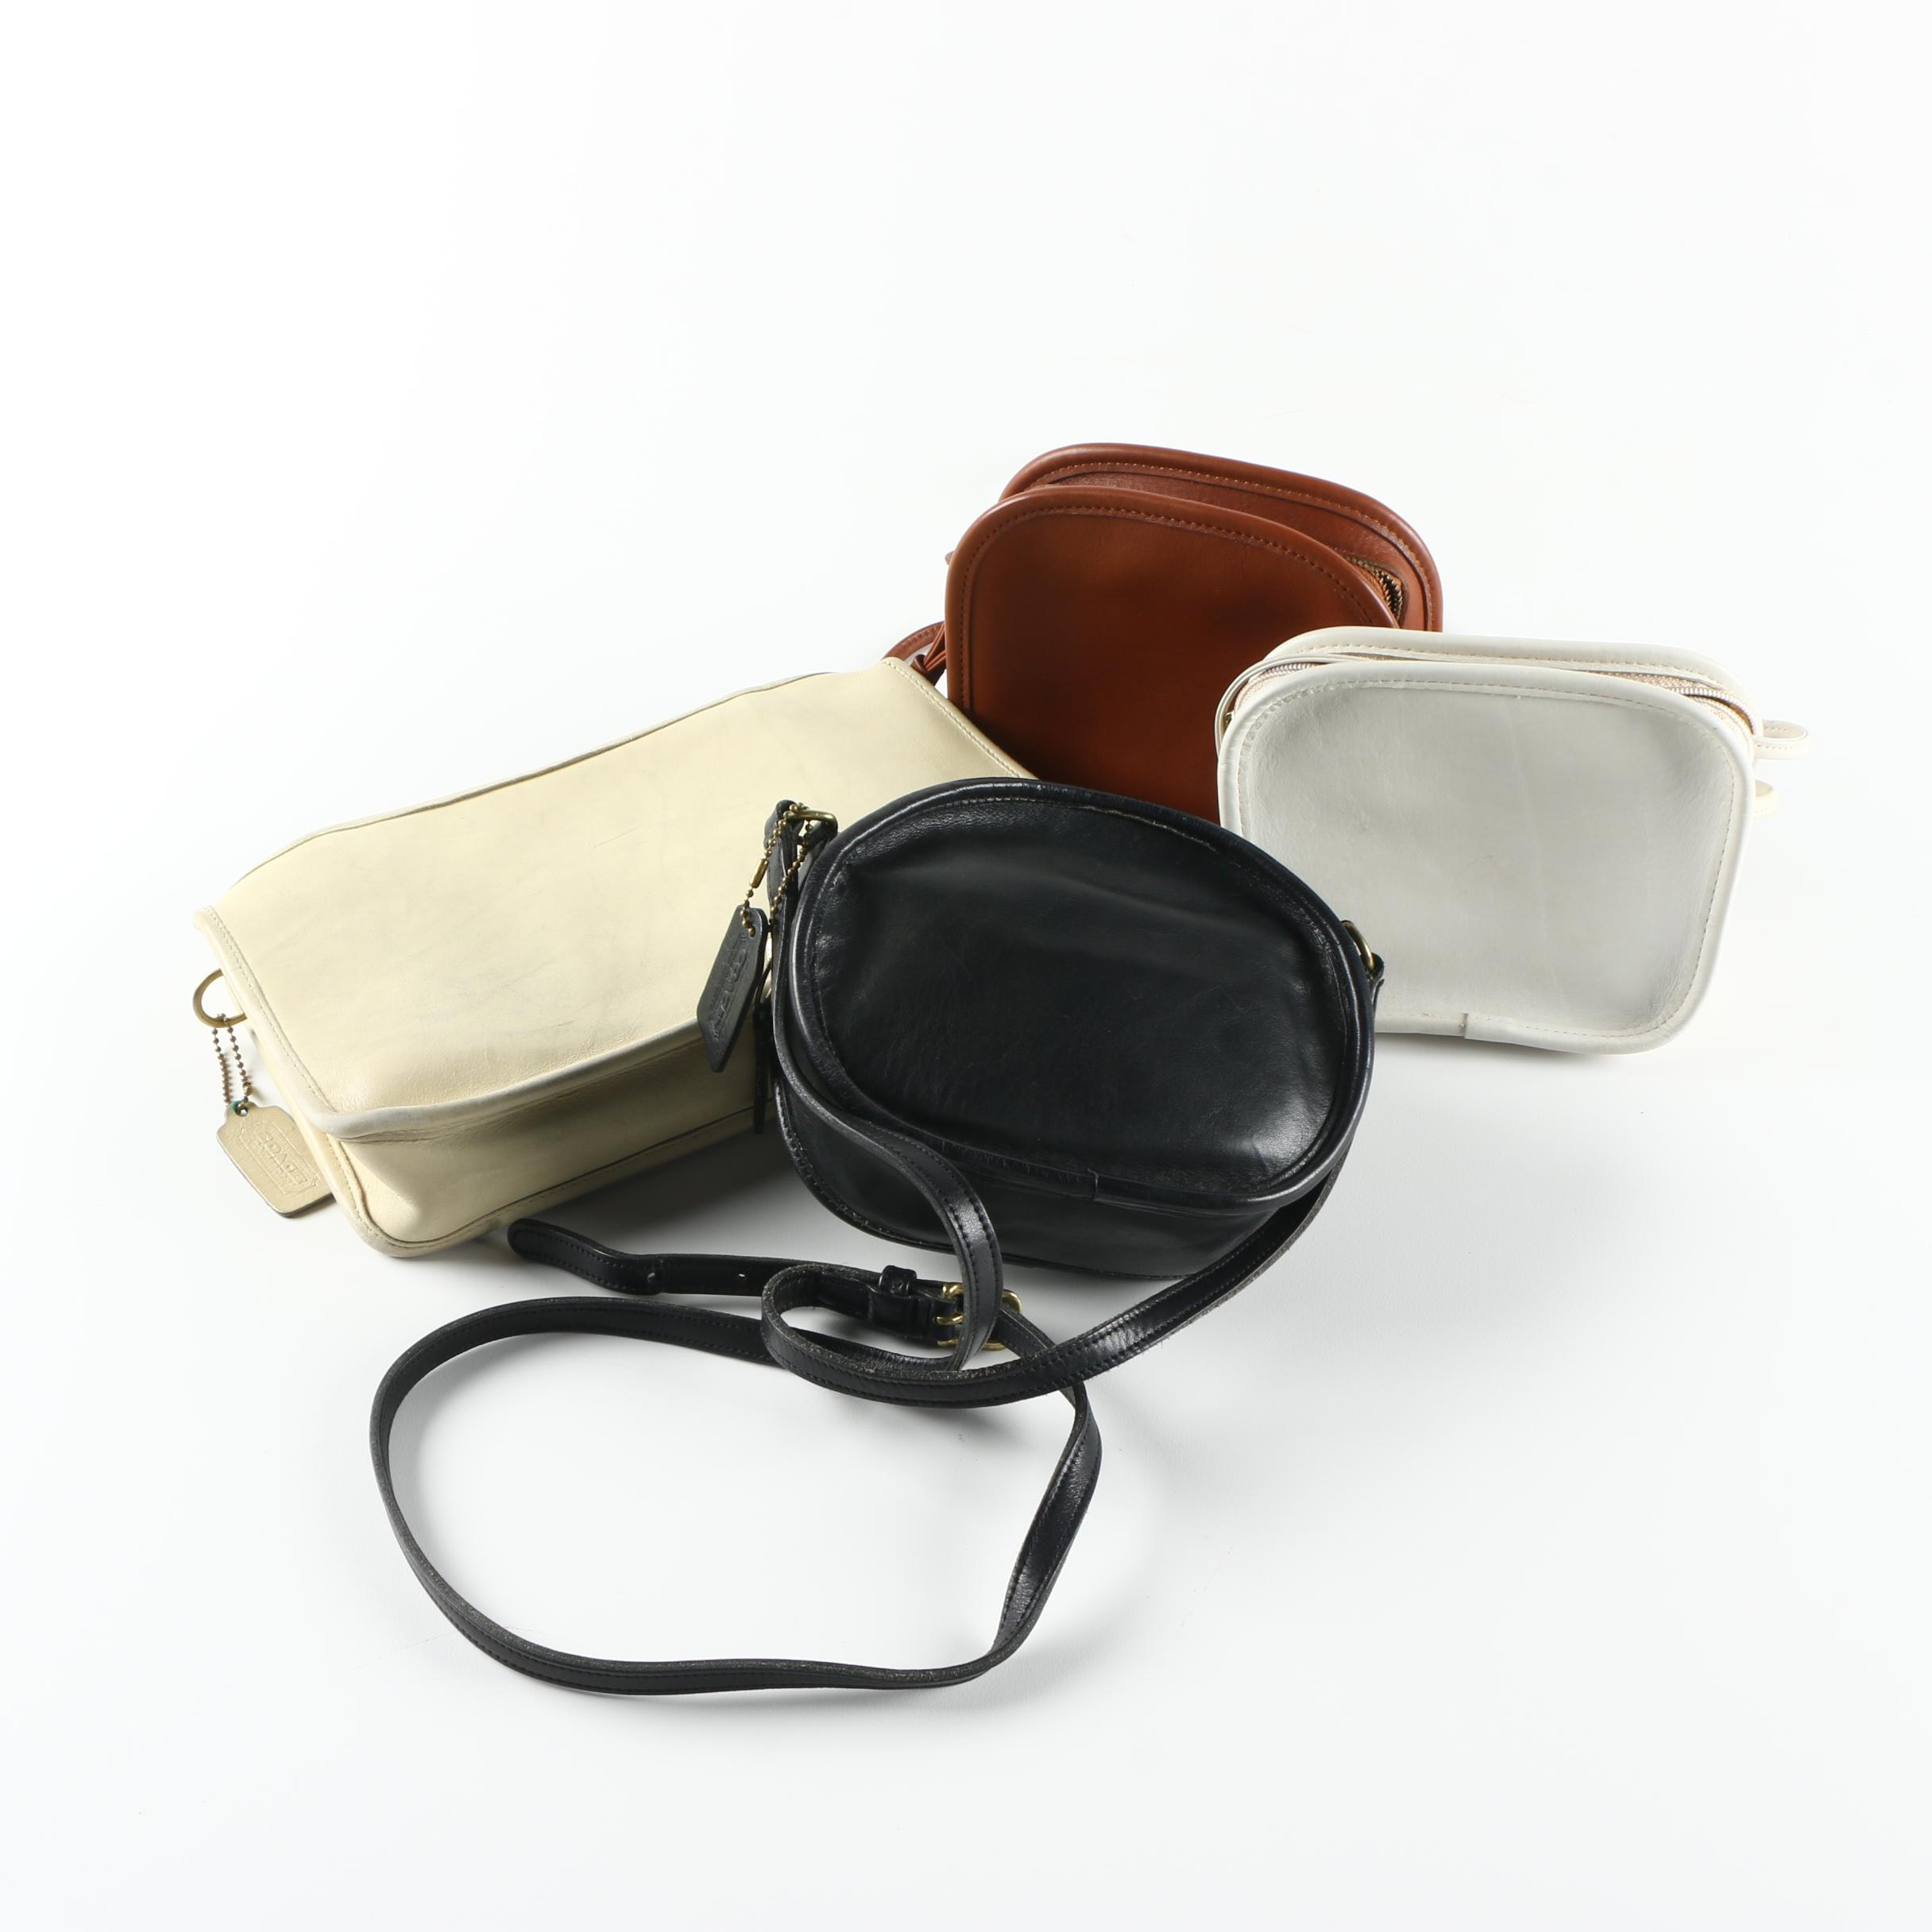 Collection of Vintage Coach Handbags